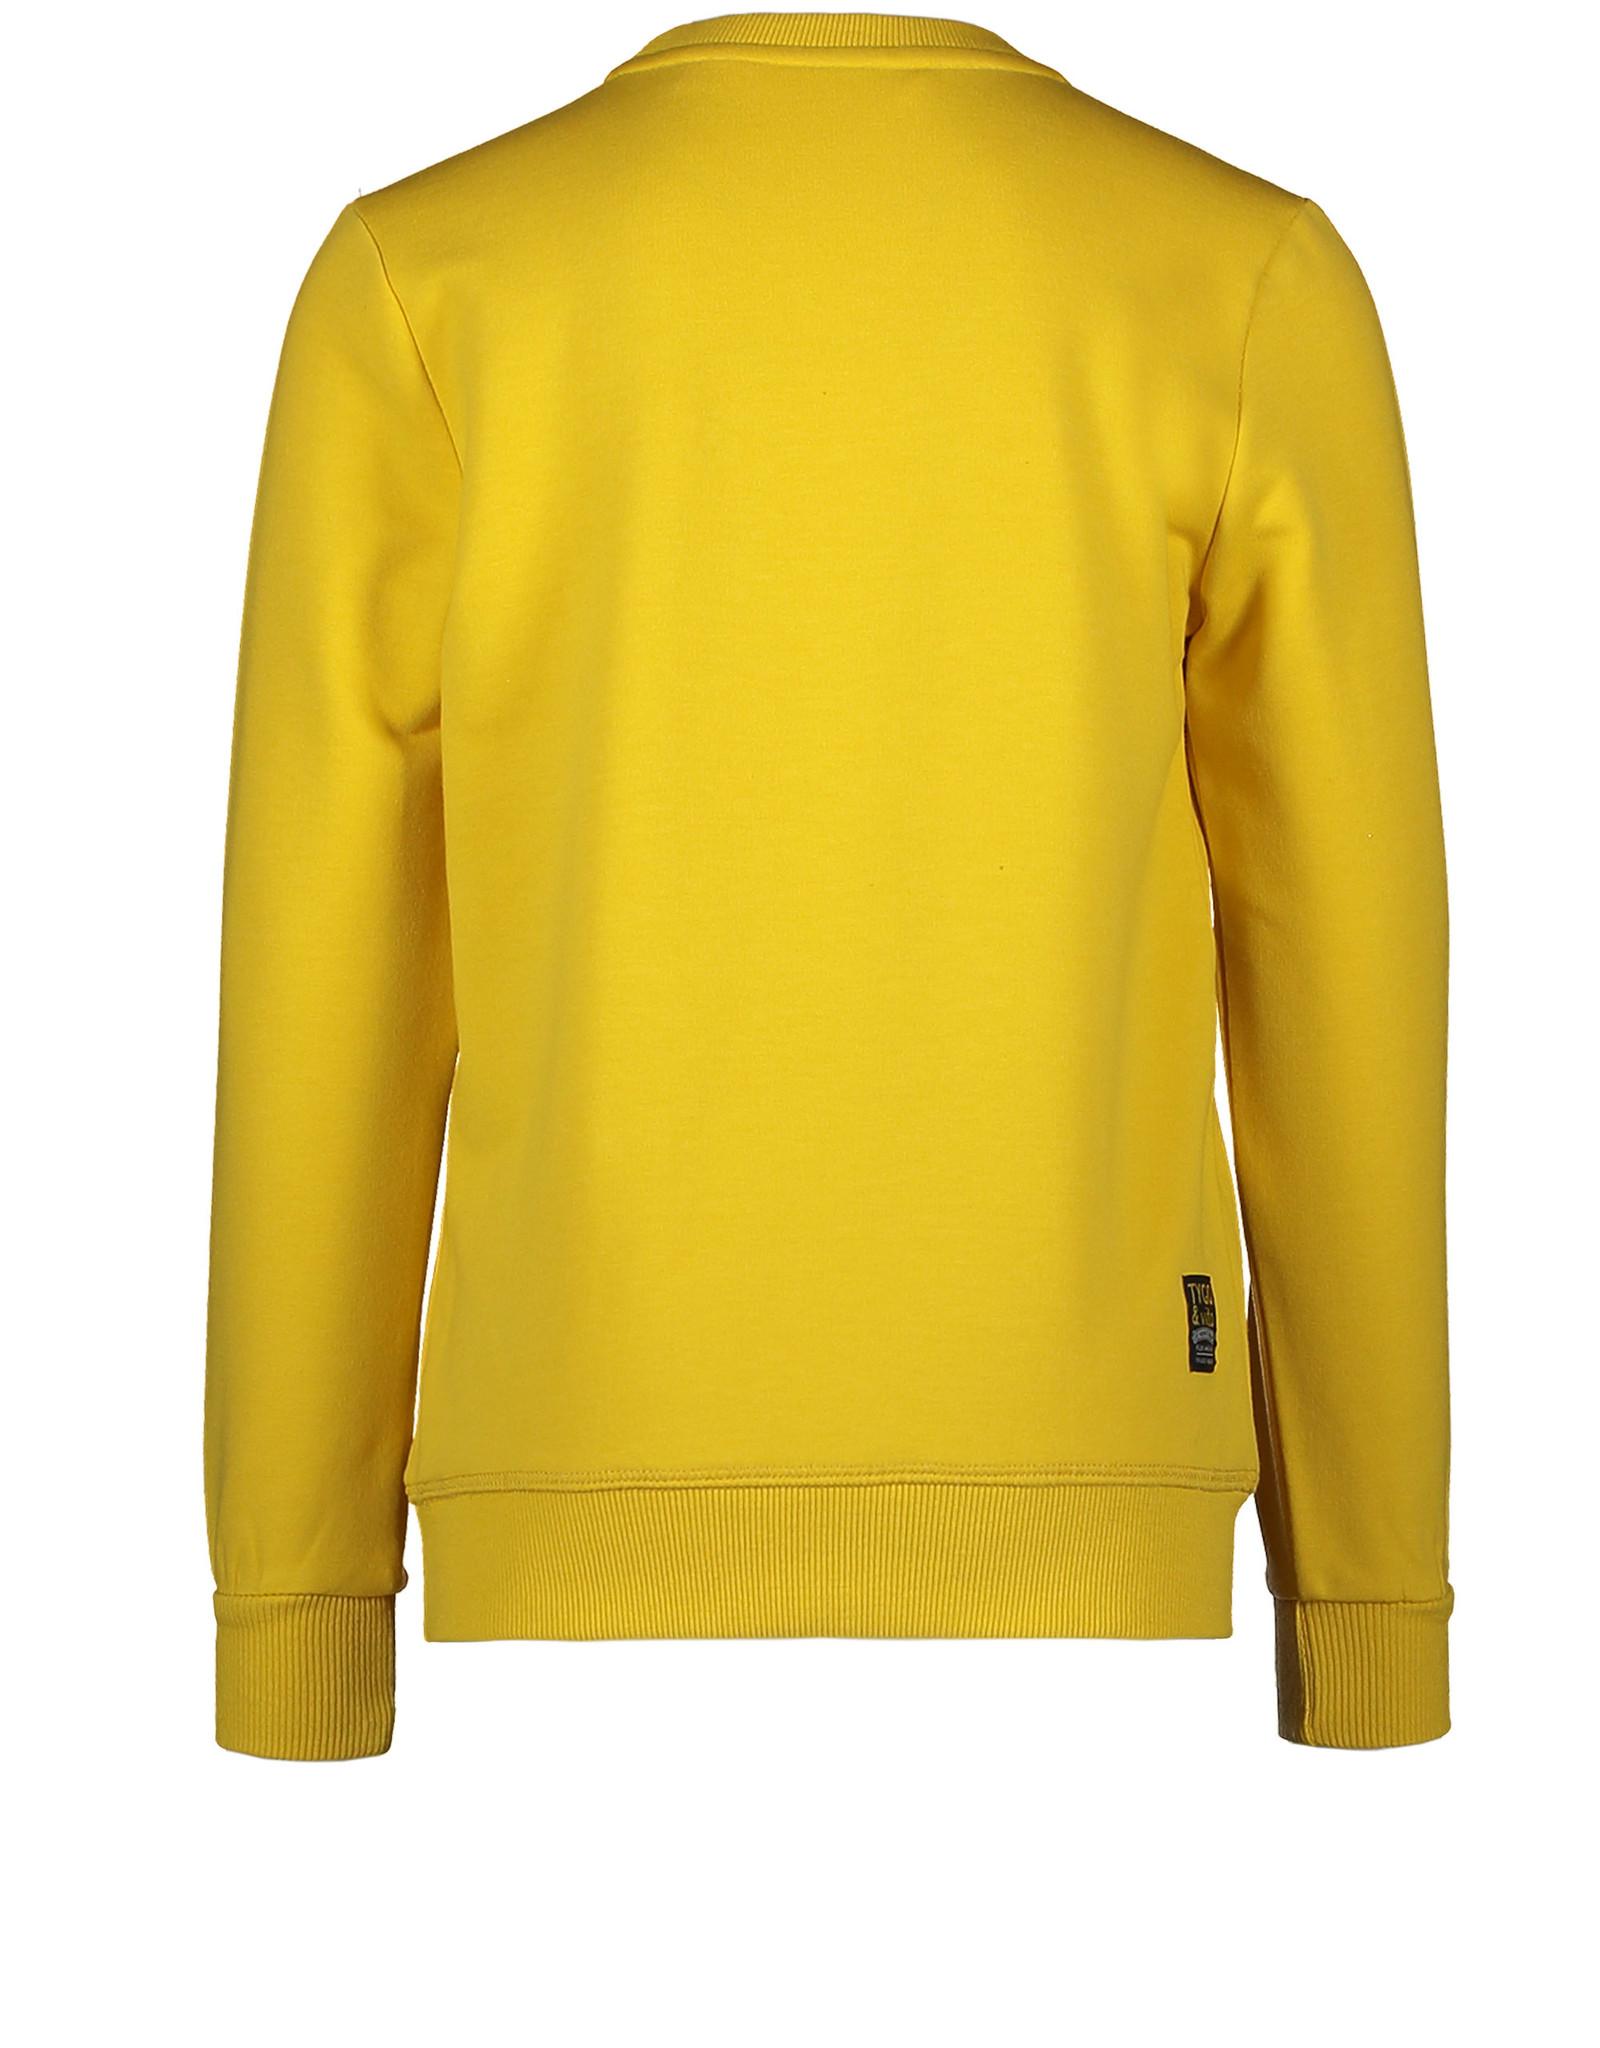 Tygo&Vito Tygo&Vito sweater 6320 yellow